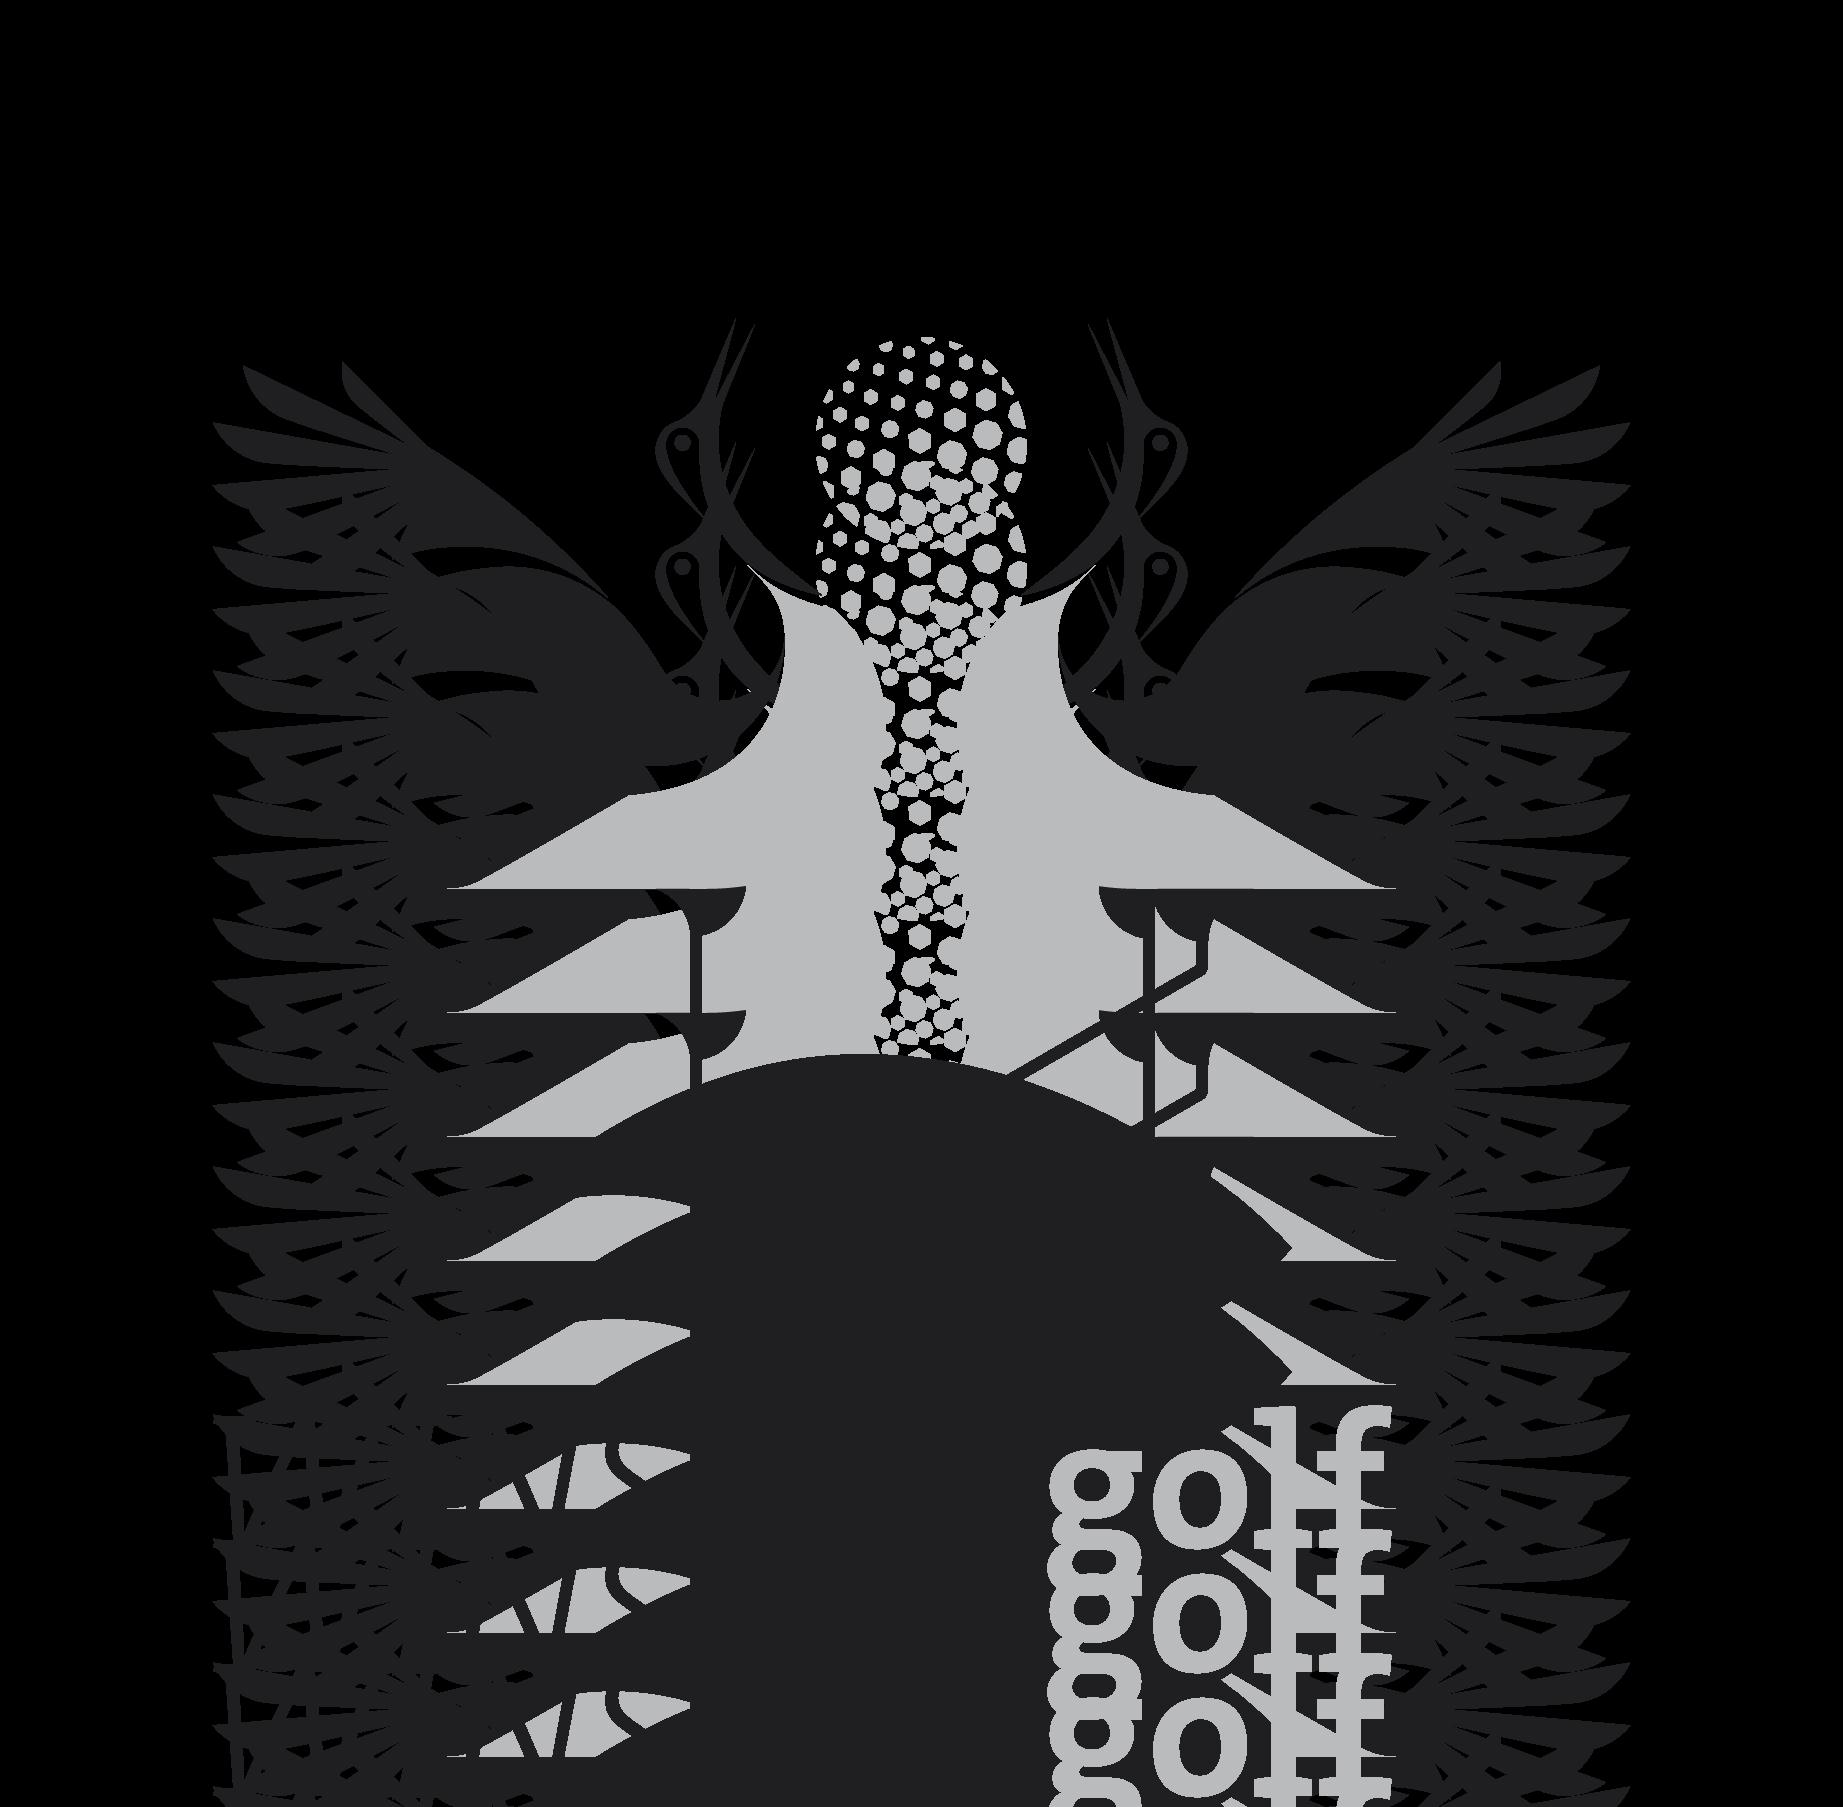 Wgolf_Logo_schwarz_grau